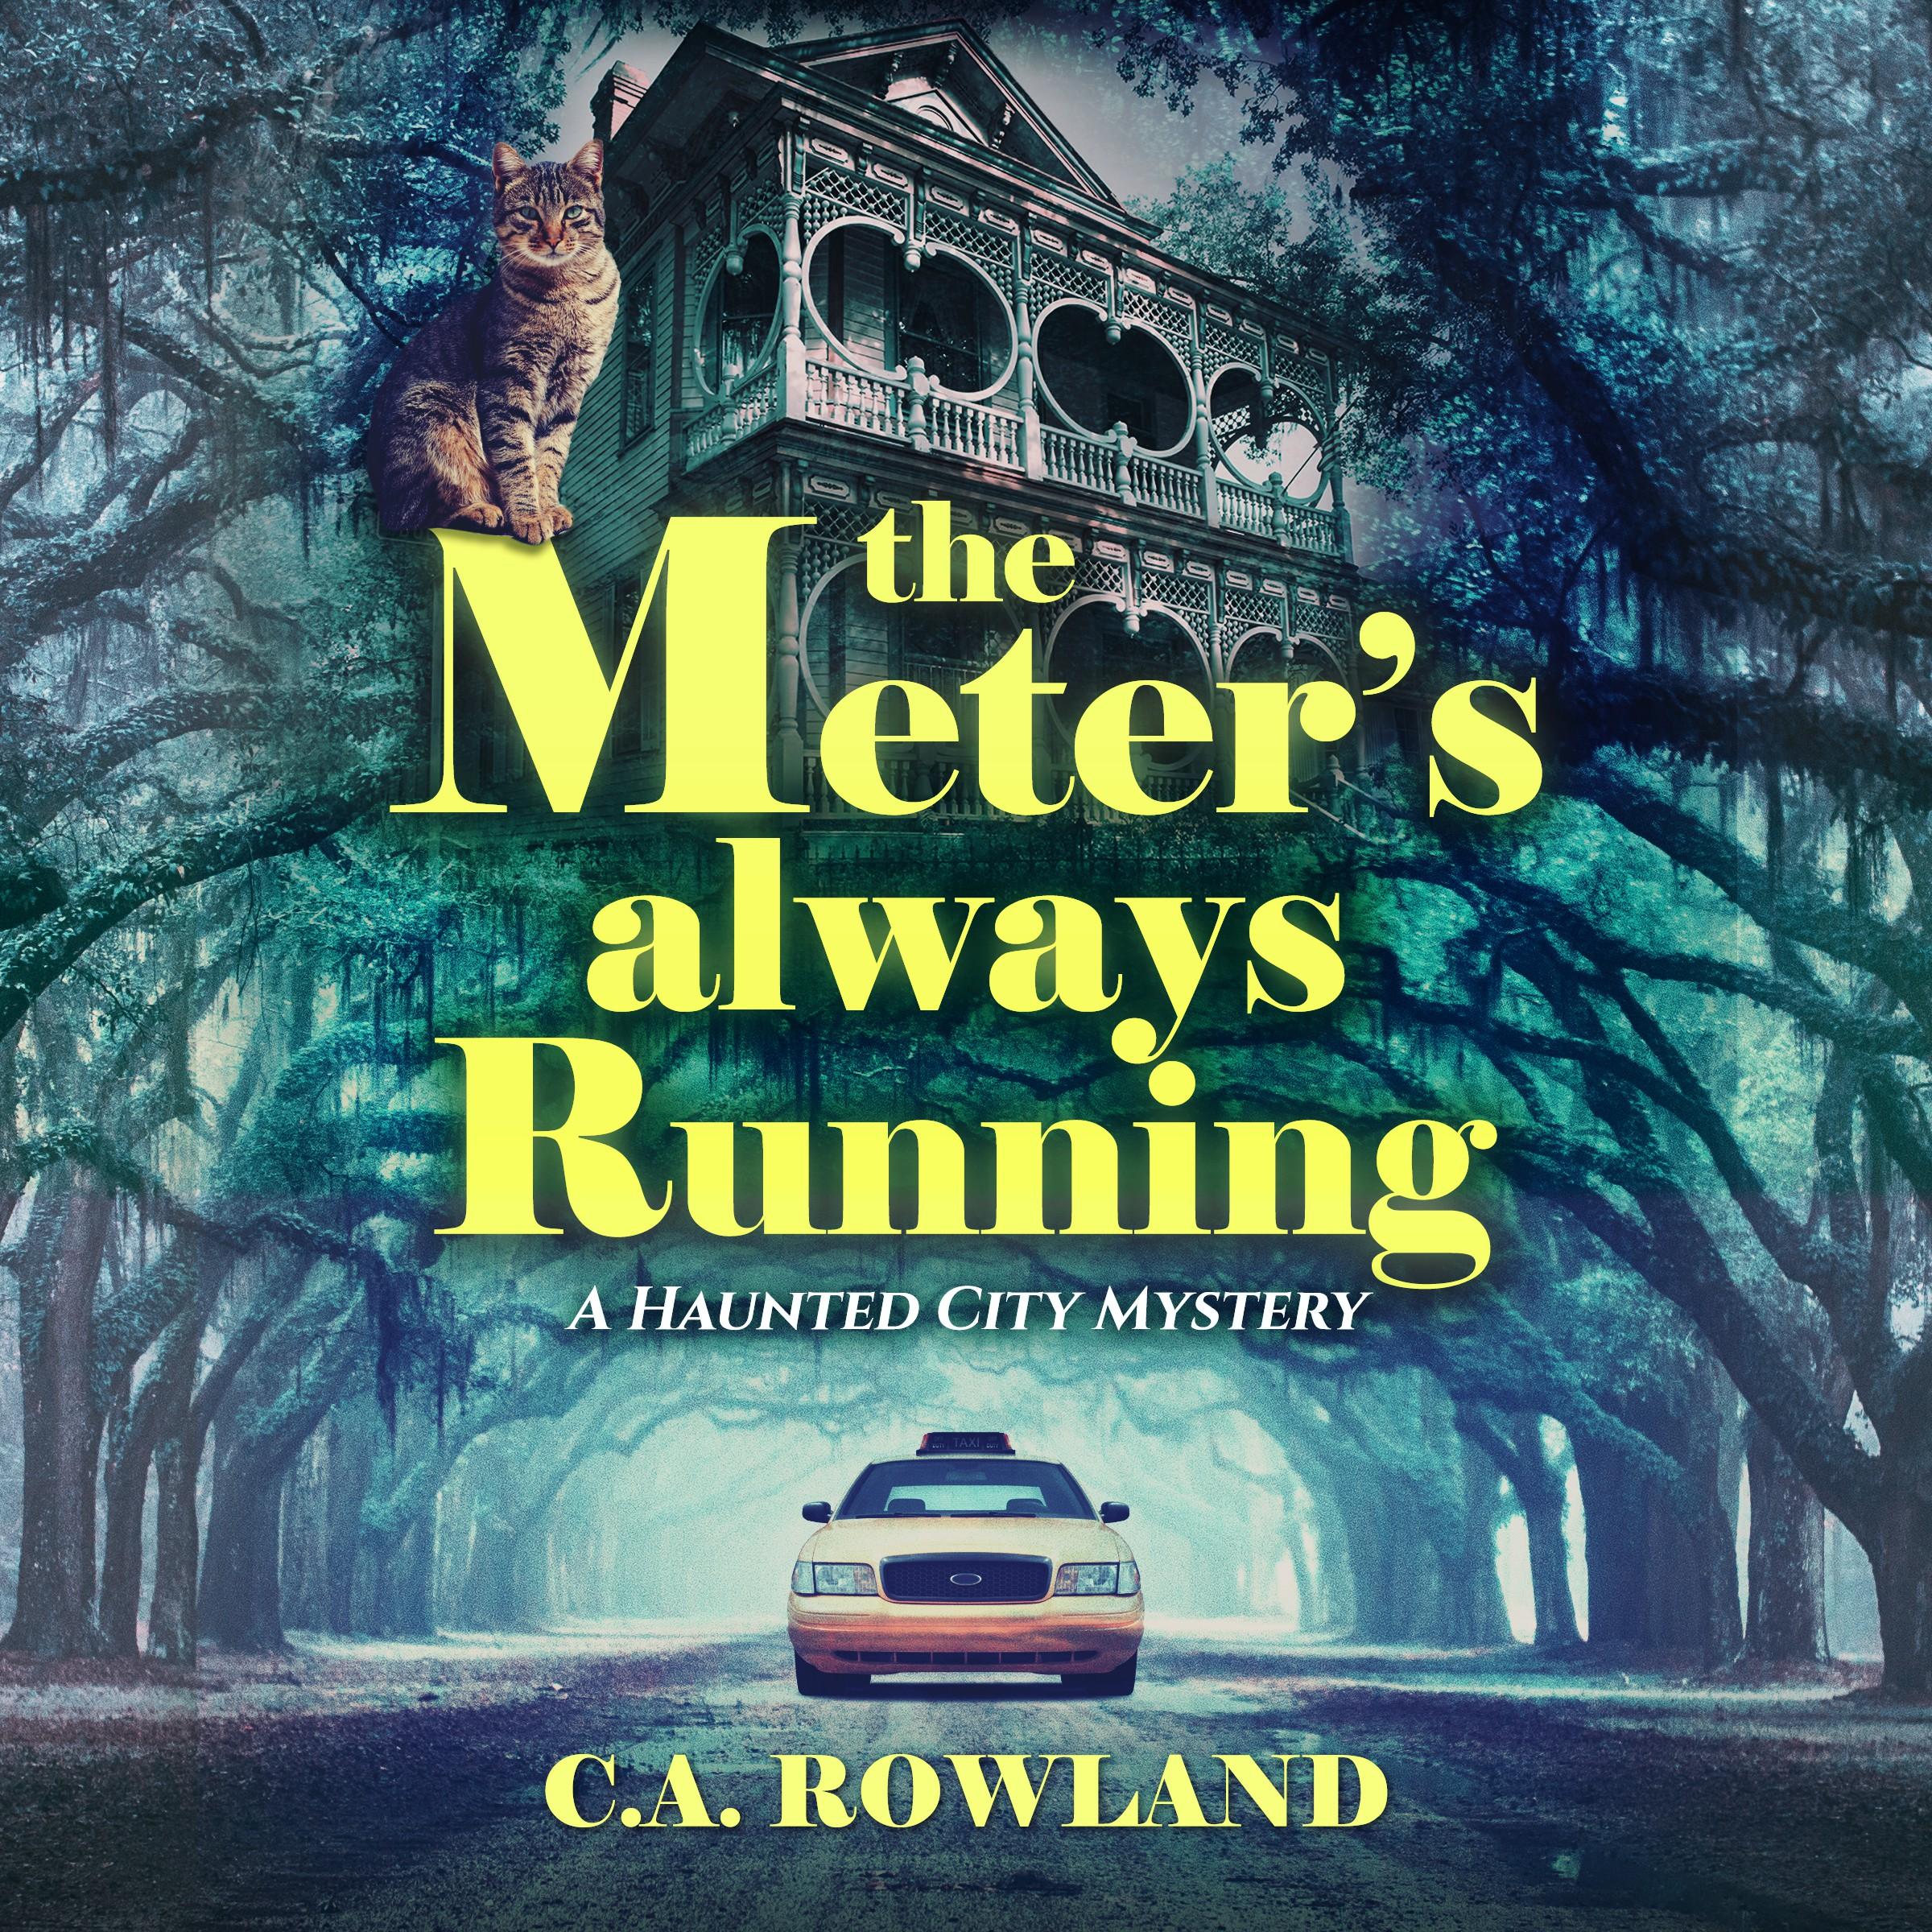 Savannah Mystery Book cover design